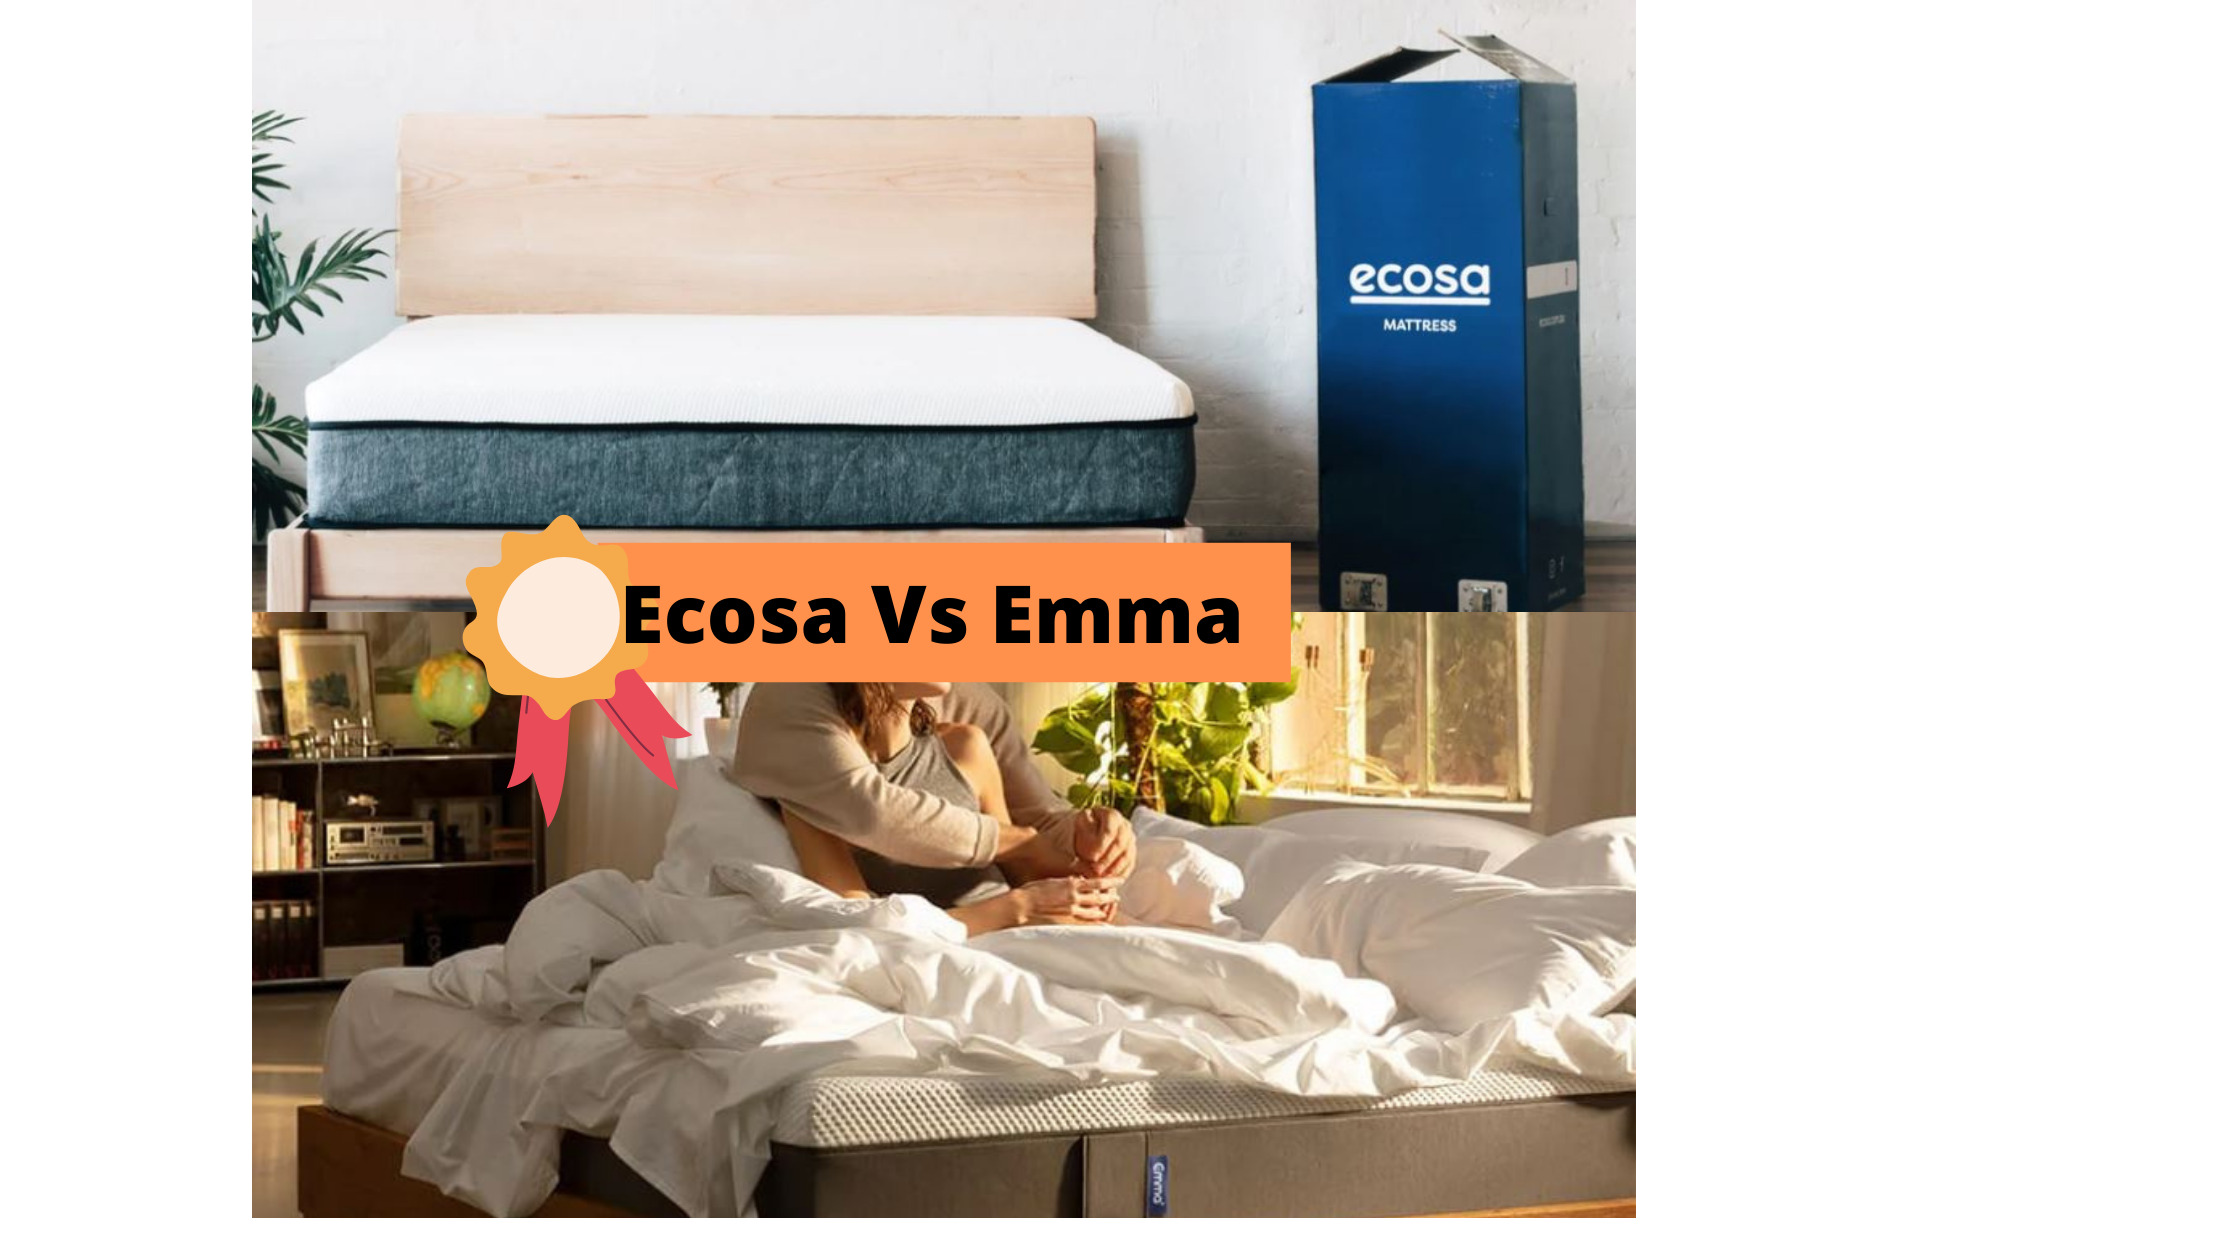 Ecosa Vs Emma - NZ Mattress In A Box Comparisons